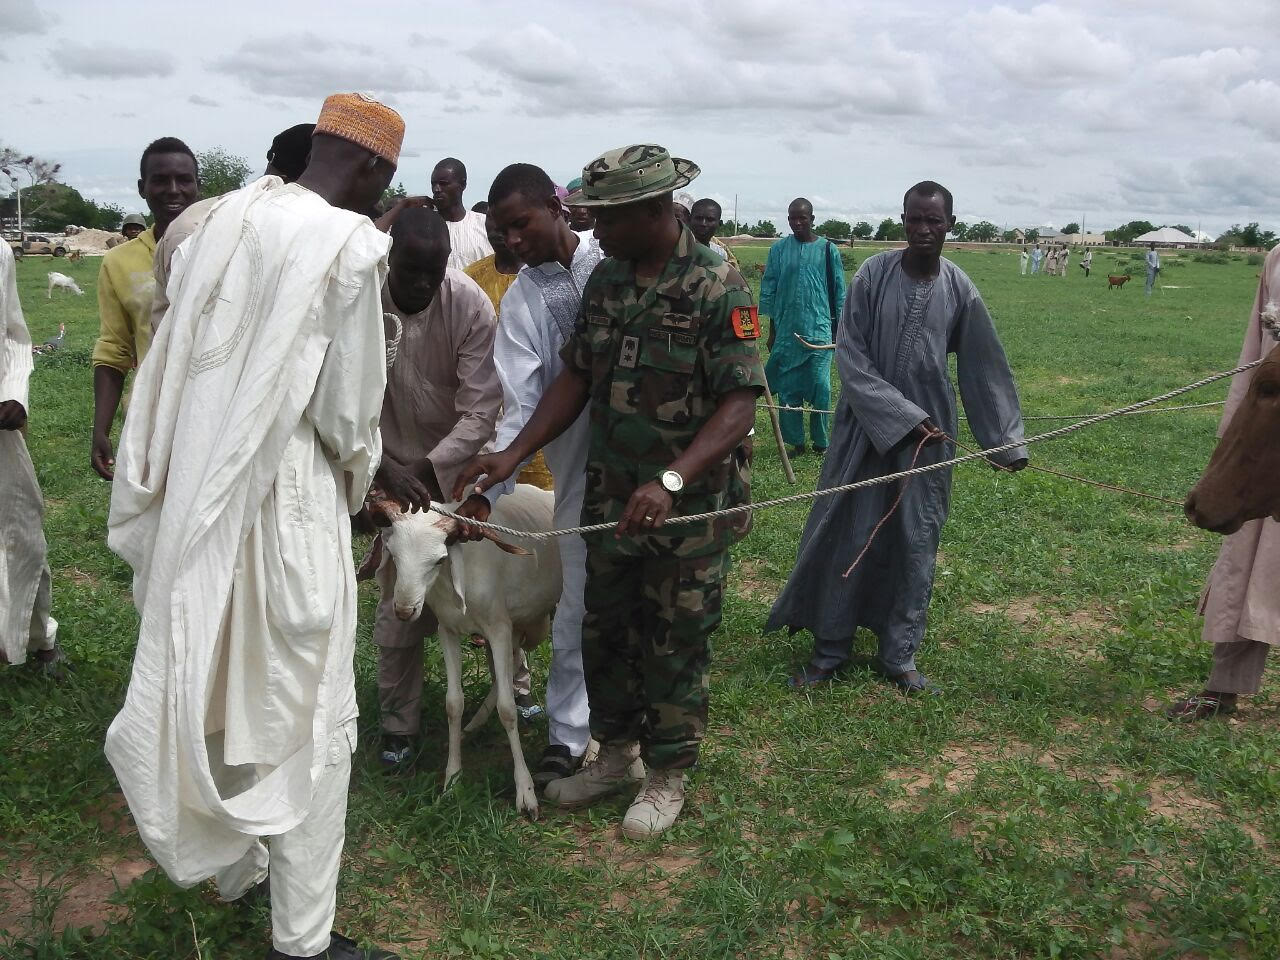 Uguma Monjok S Blog The Sinister Plot To Introduce National Grazing Reserves Via Nigerian Army